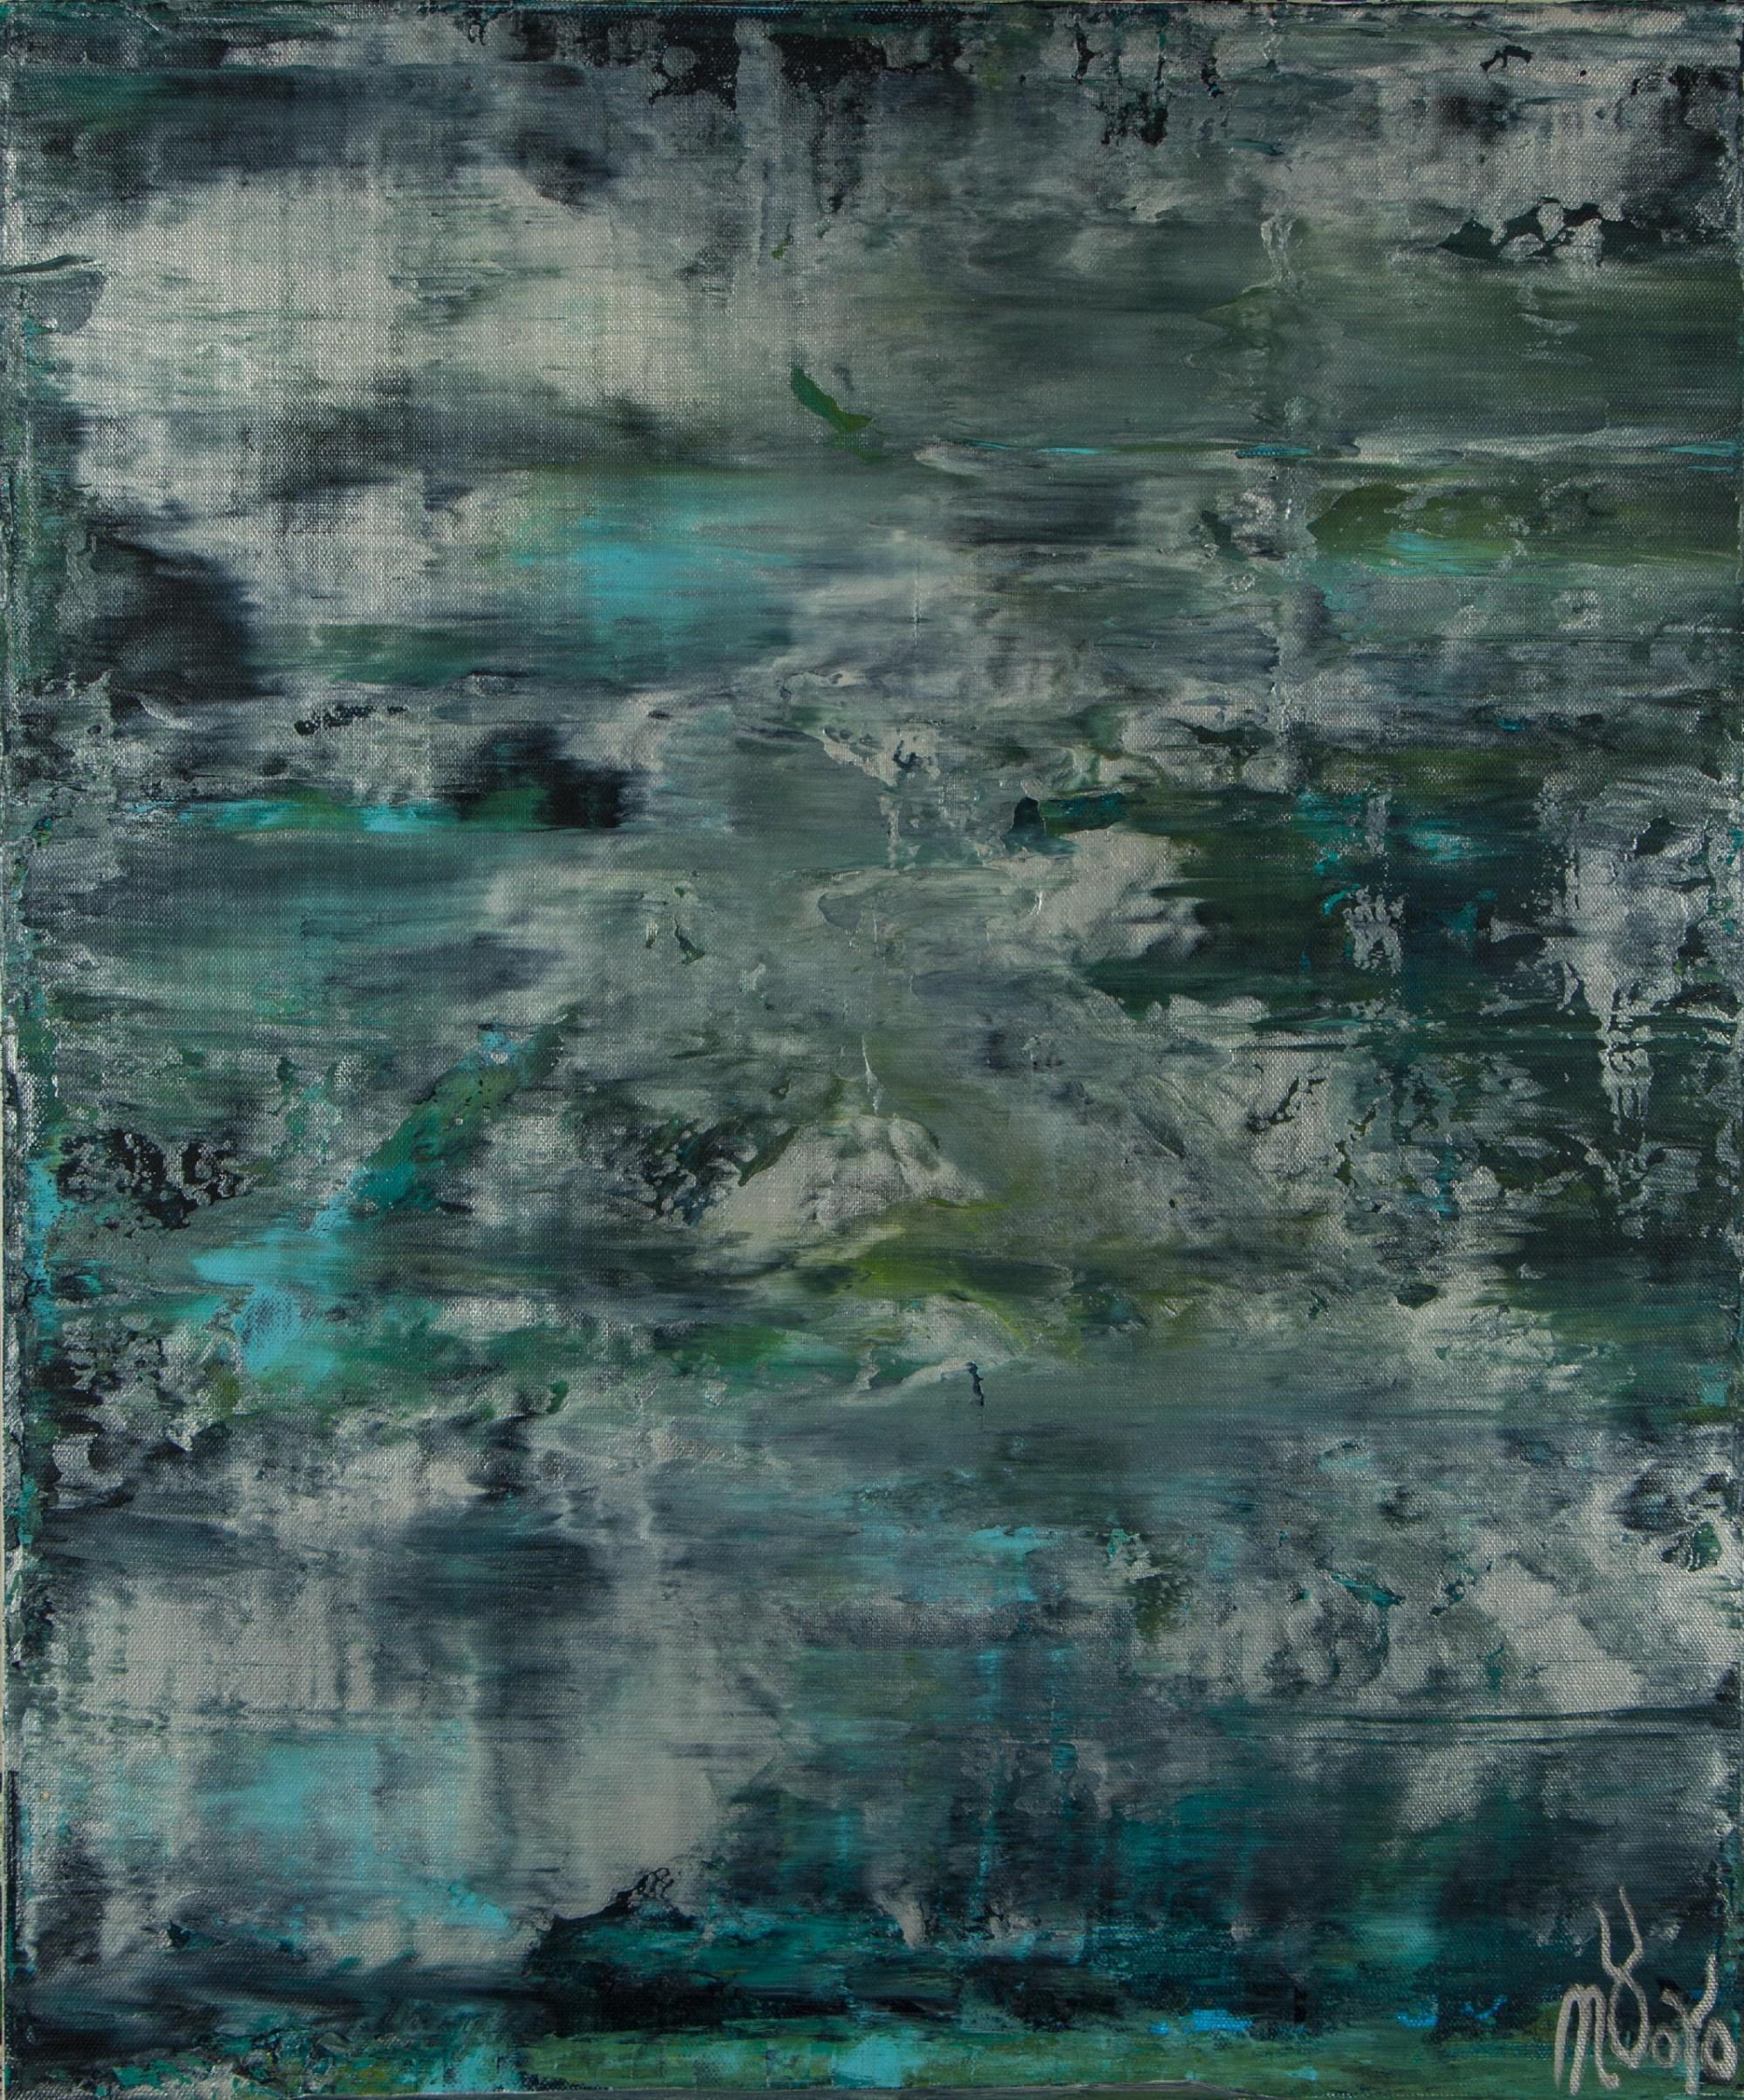 Waterflow (Night Clouds) / (2021) / Artist - Nestor Toro